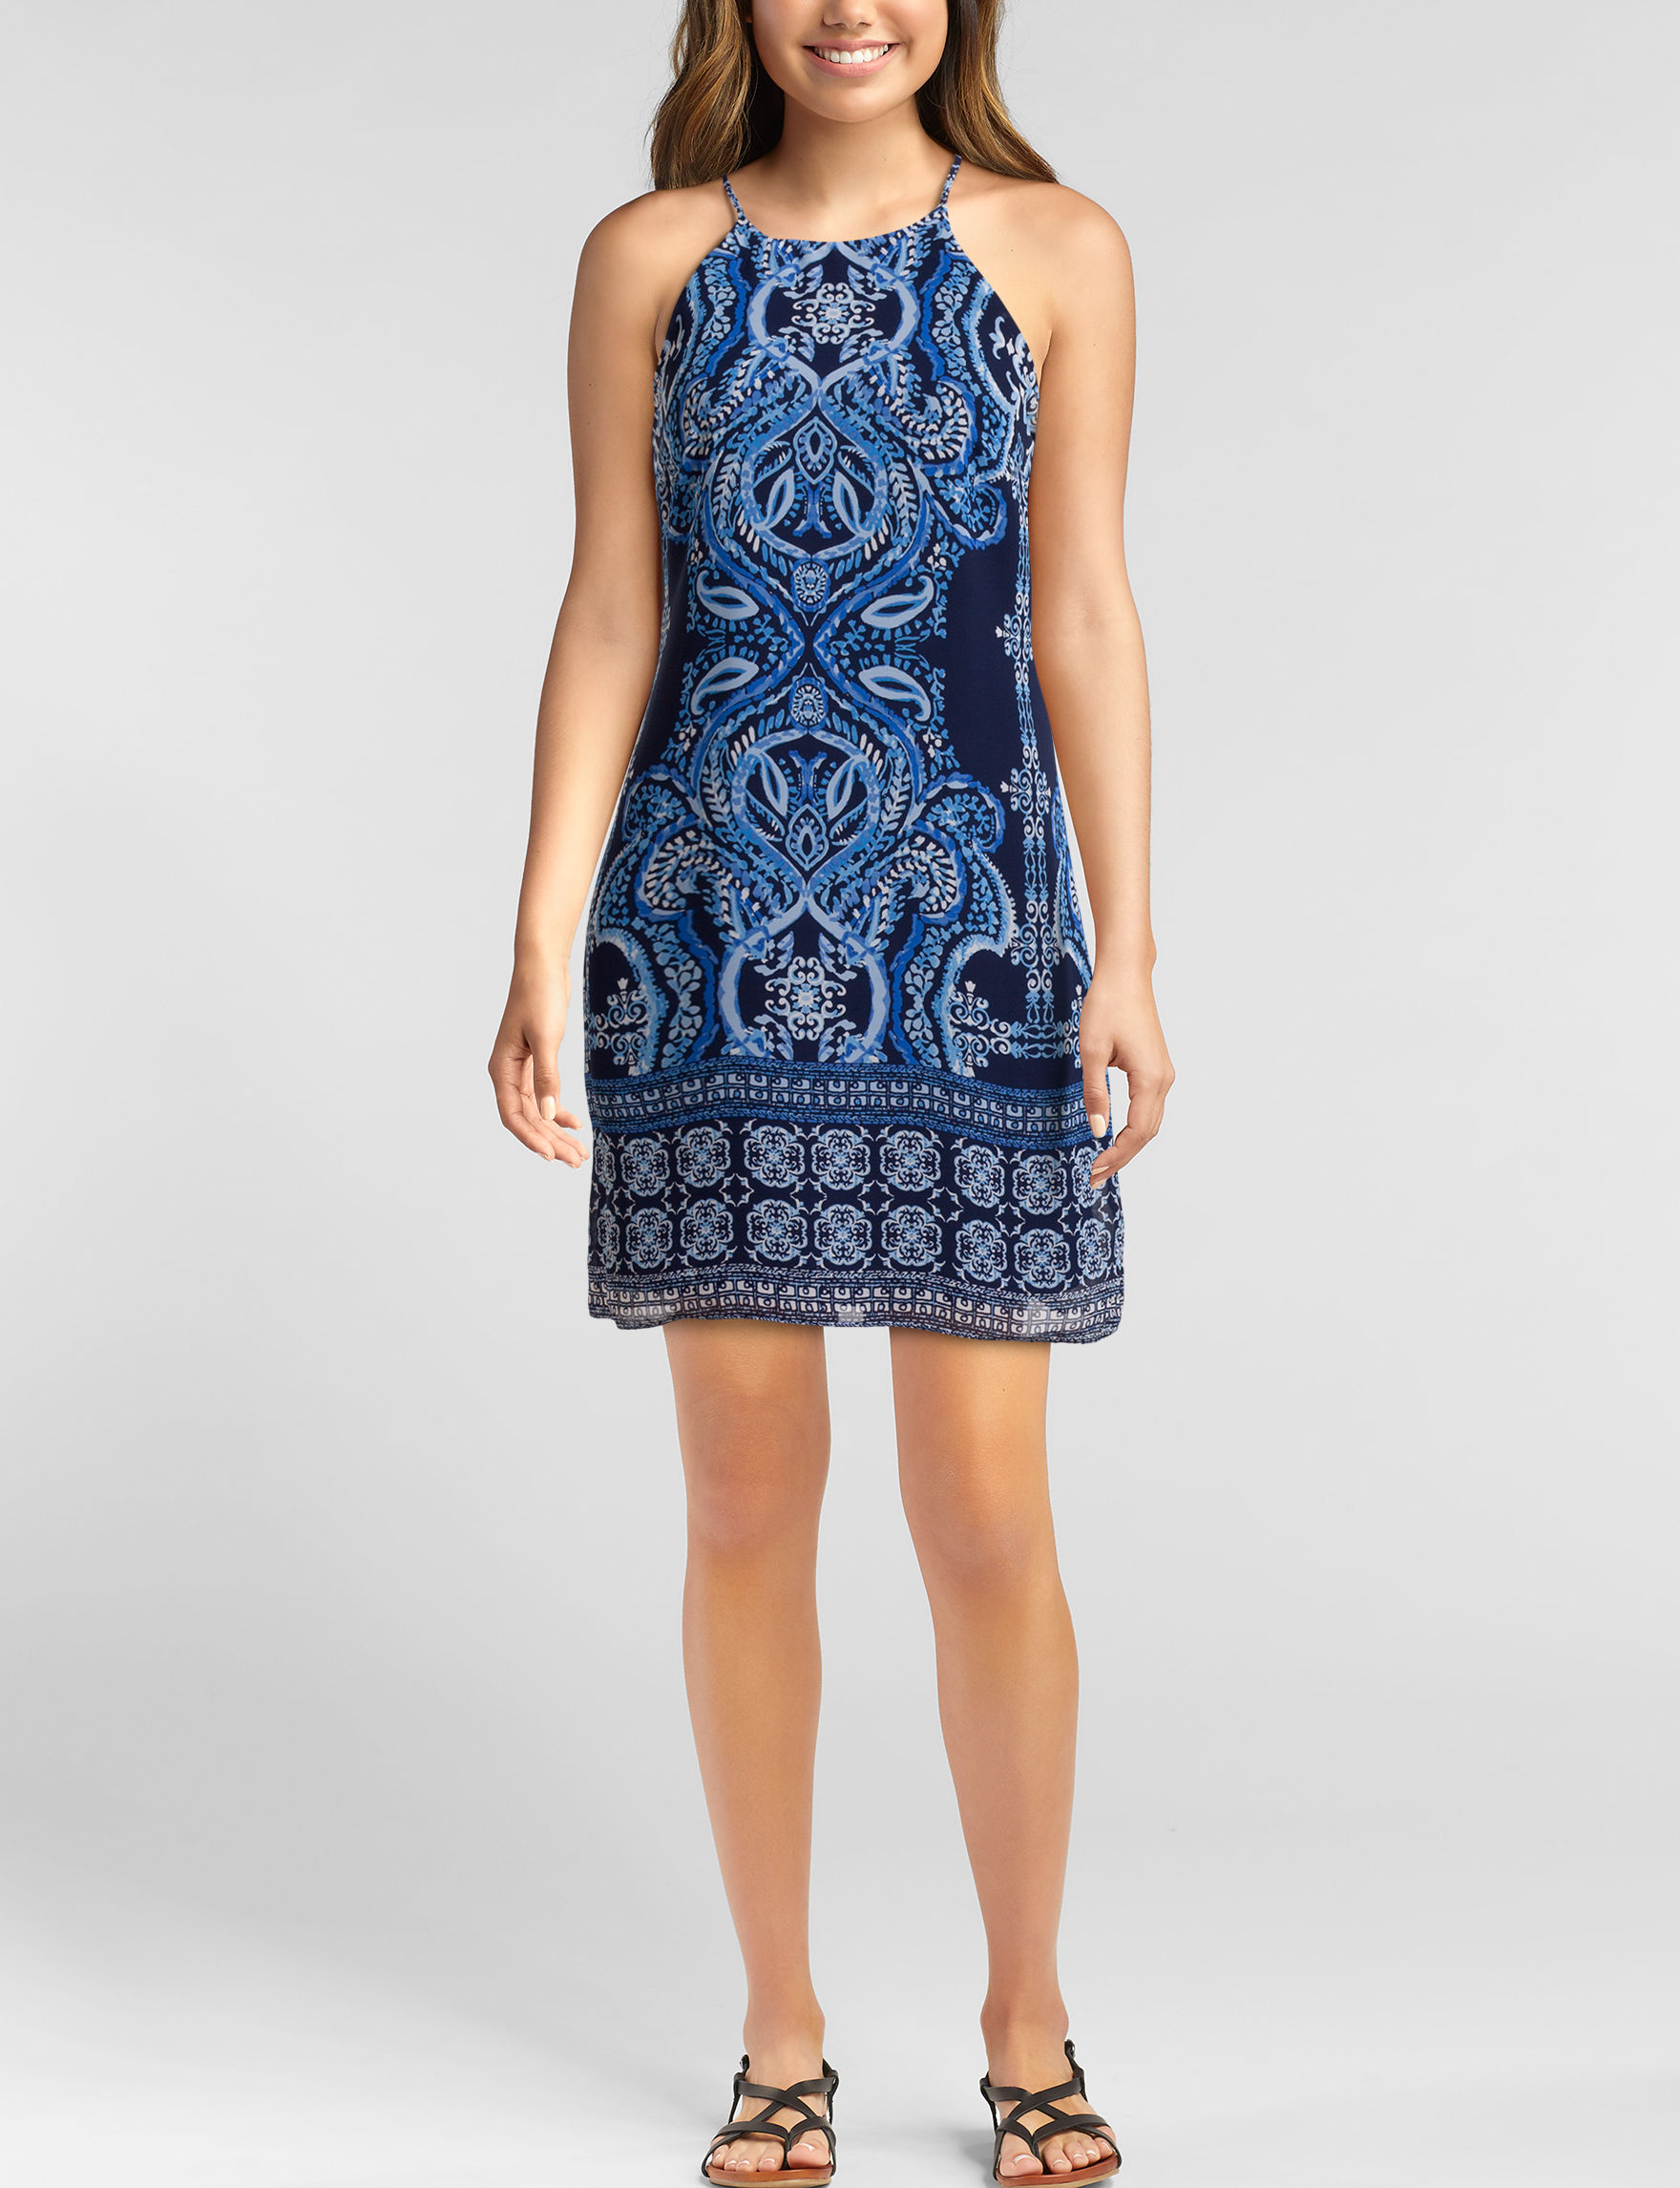 A. Byer Blue Shift Dresses